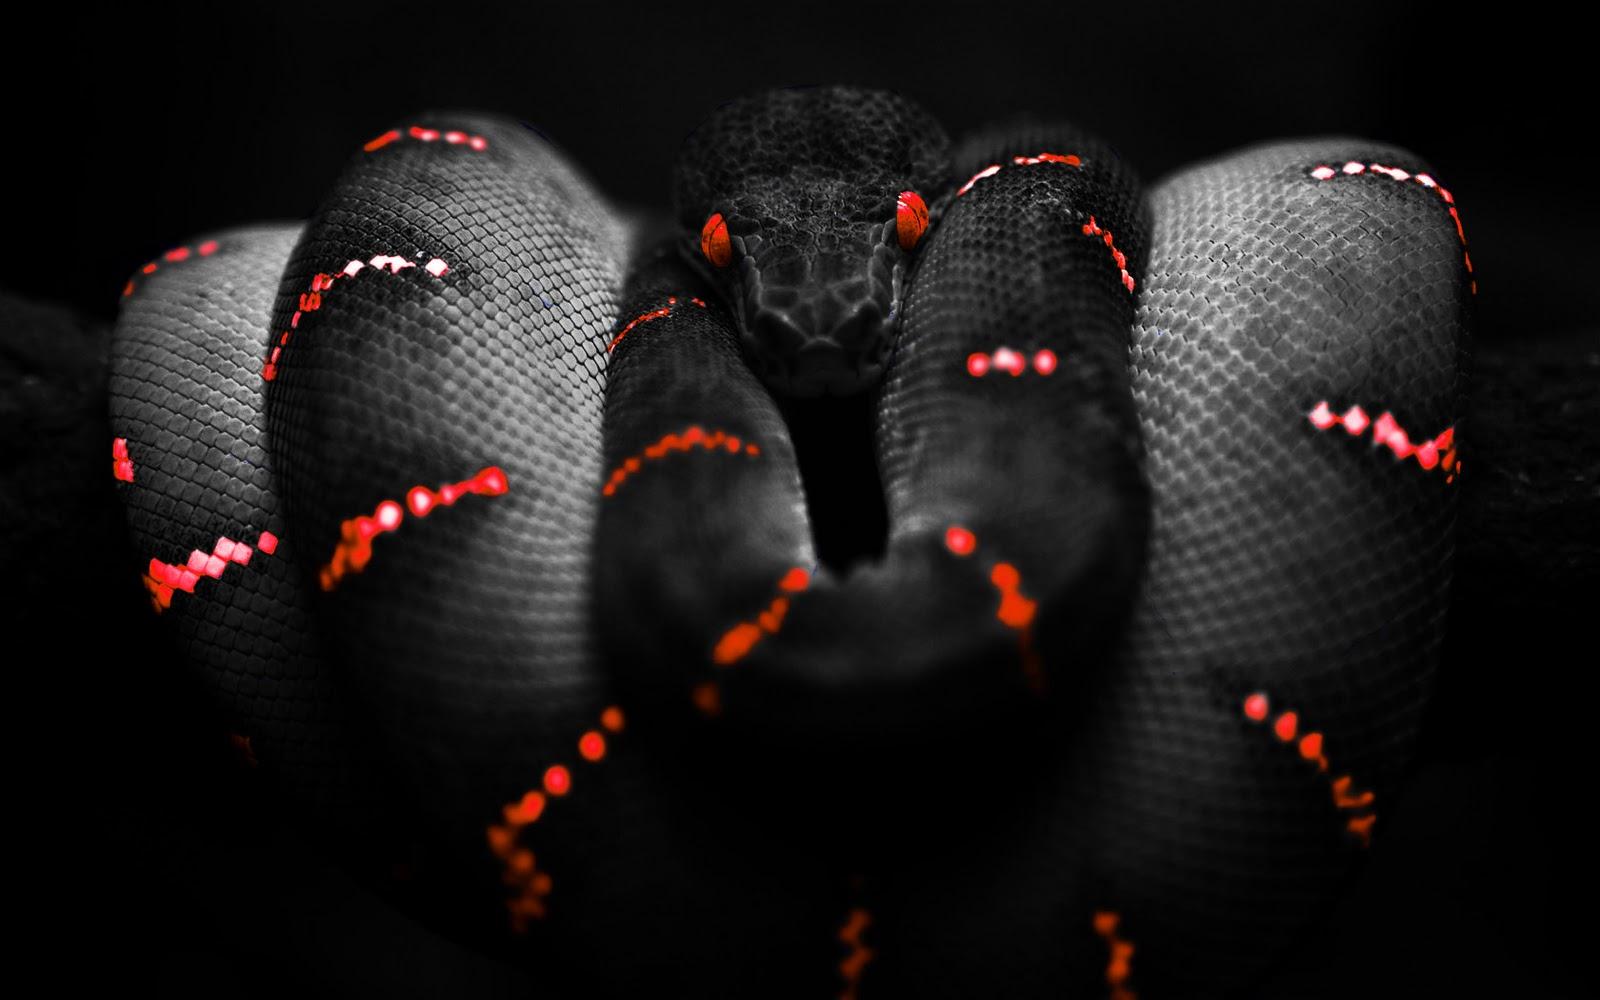 http://3.bp.blogspot.com/-Tk-GuLHdYc0/TcLxQe2N51I/AAAAAAAAAgA/SsK3yNU99yw/s1600/Photoshop_Snake_HD_wallpaper_red.jpg